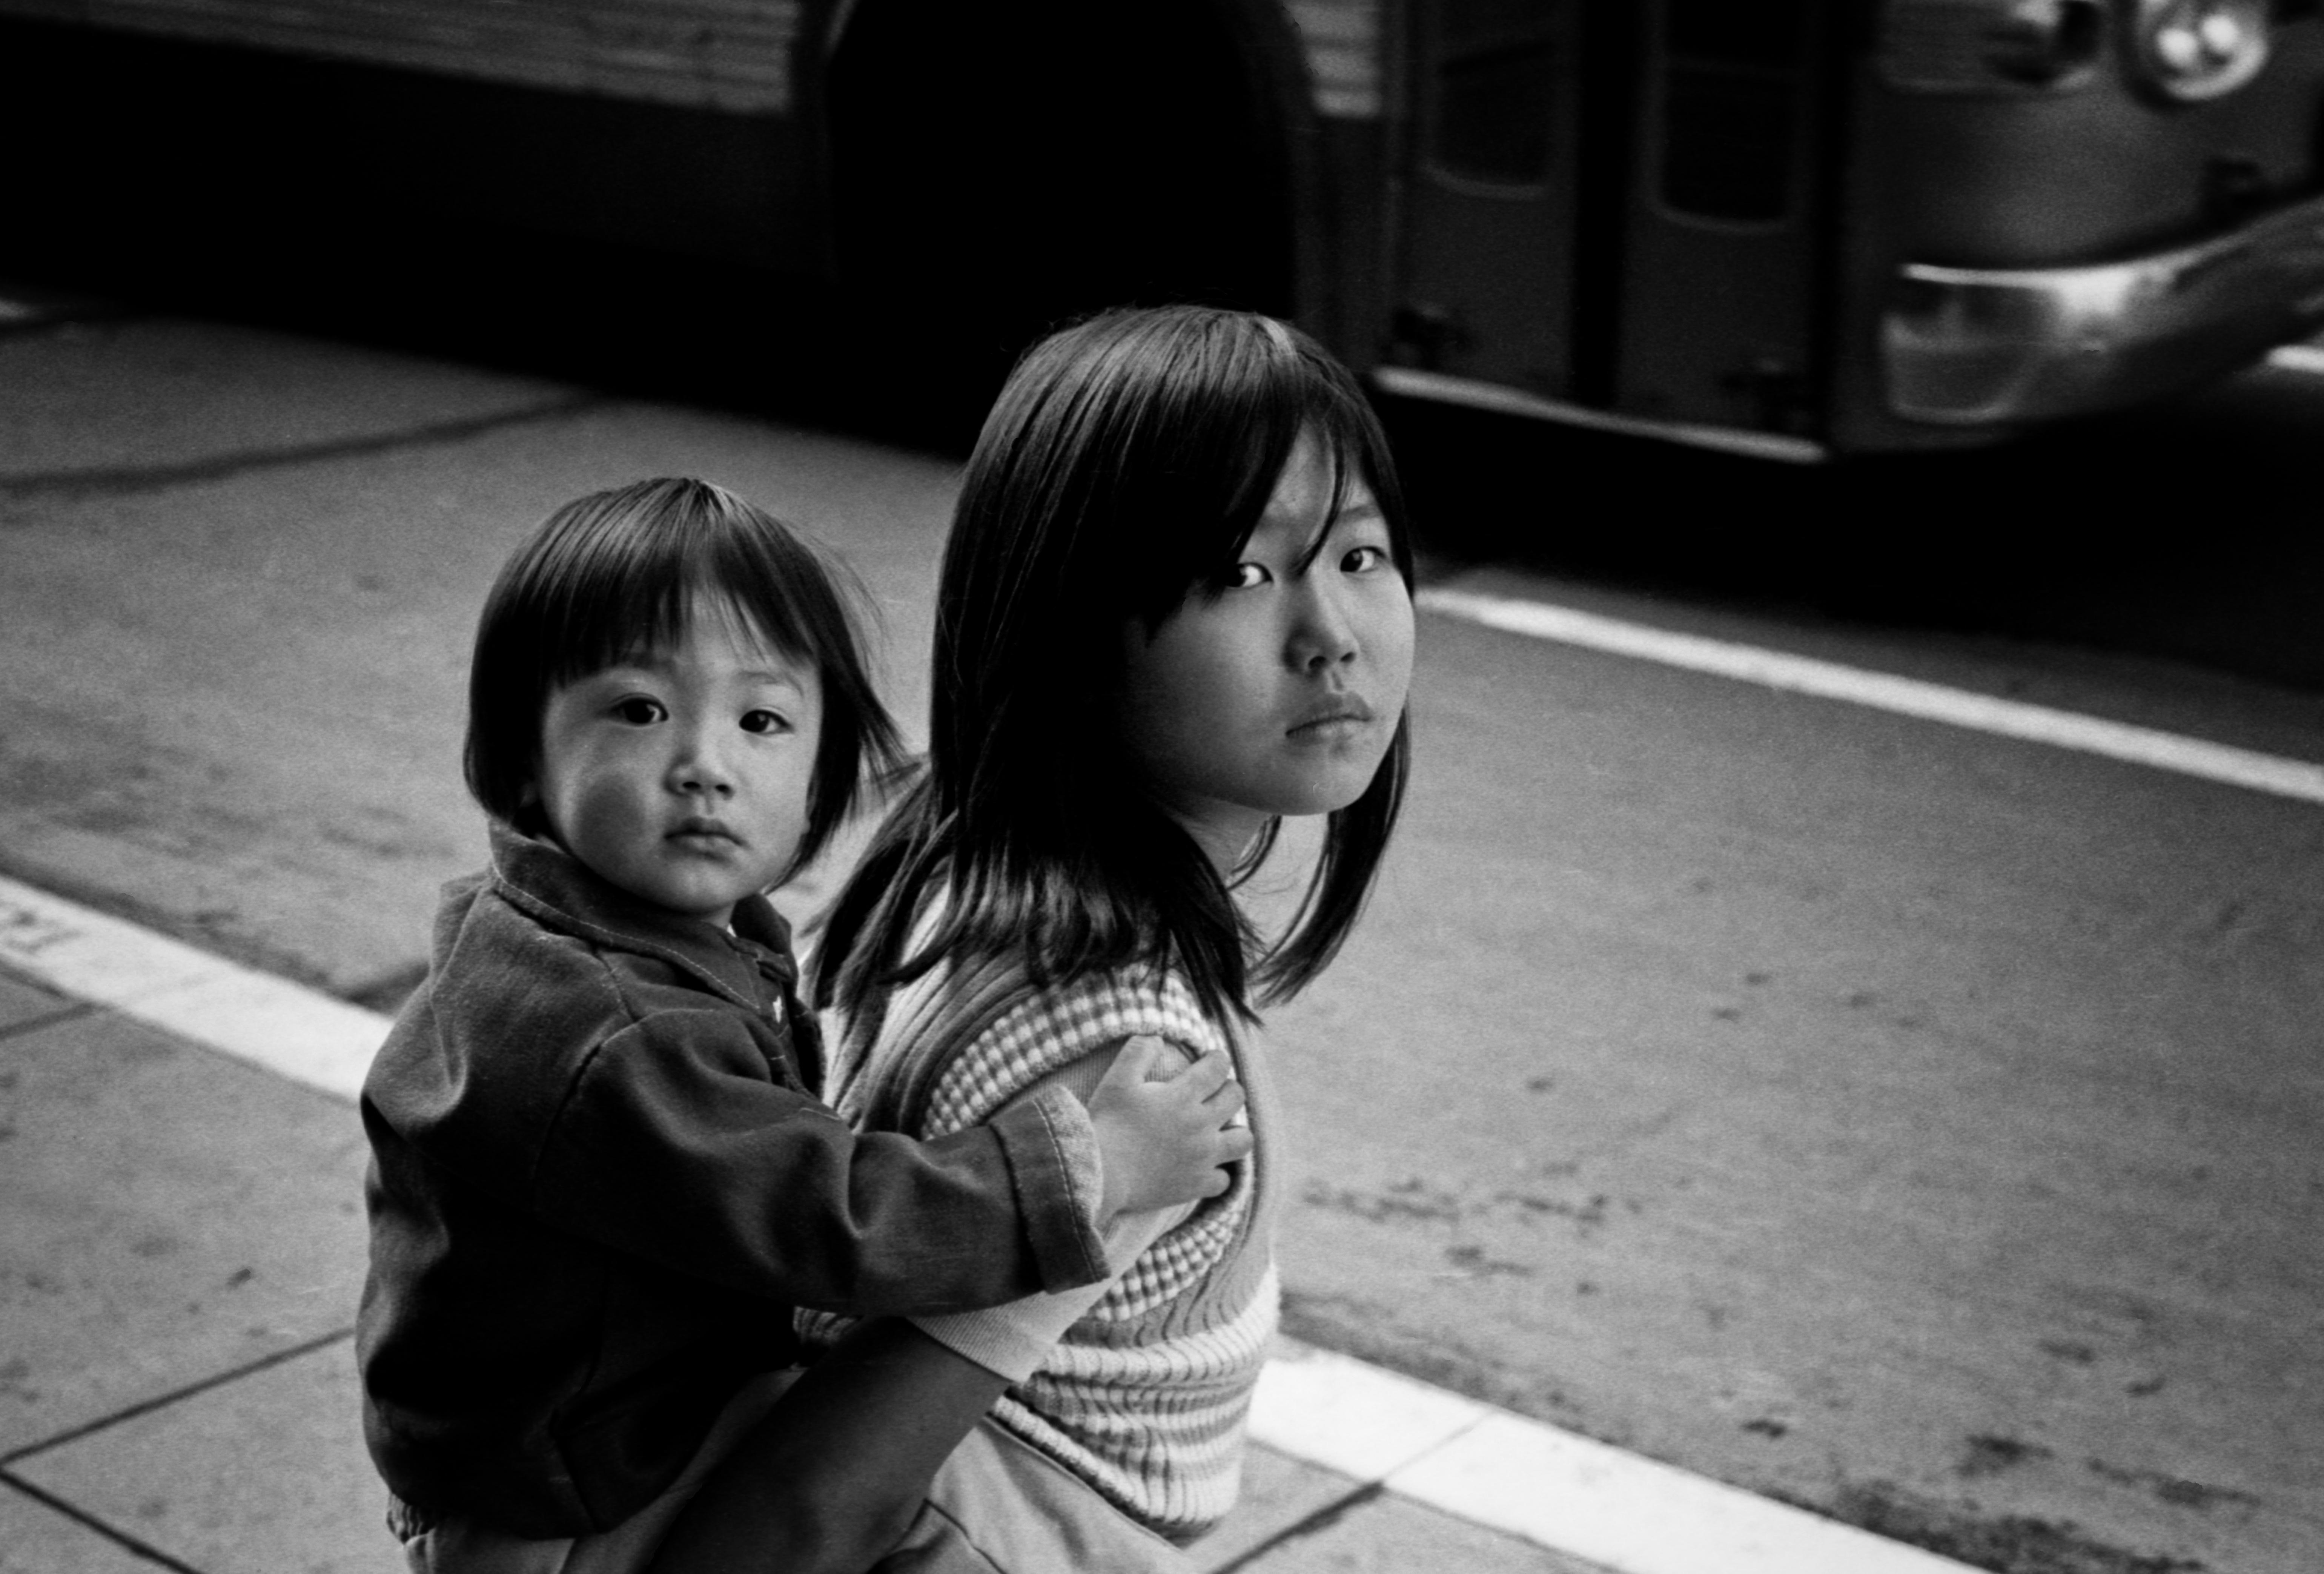 Children nude on camera Two Oriental Children copyright 1971 Daniel D. Teoli Jr.